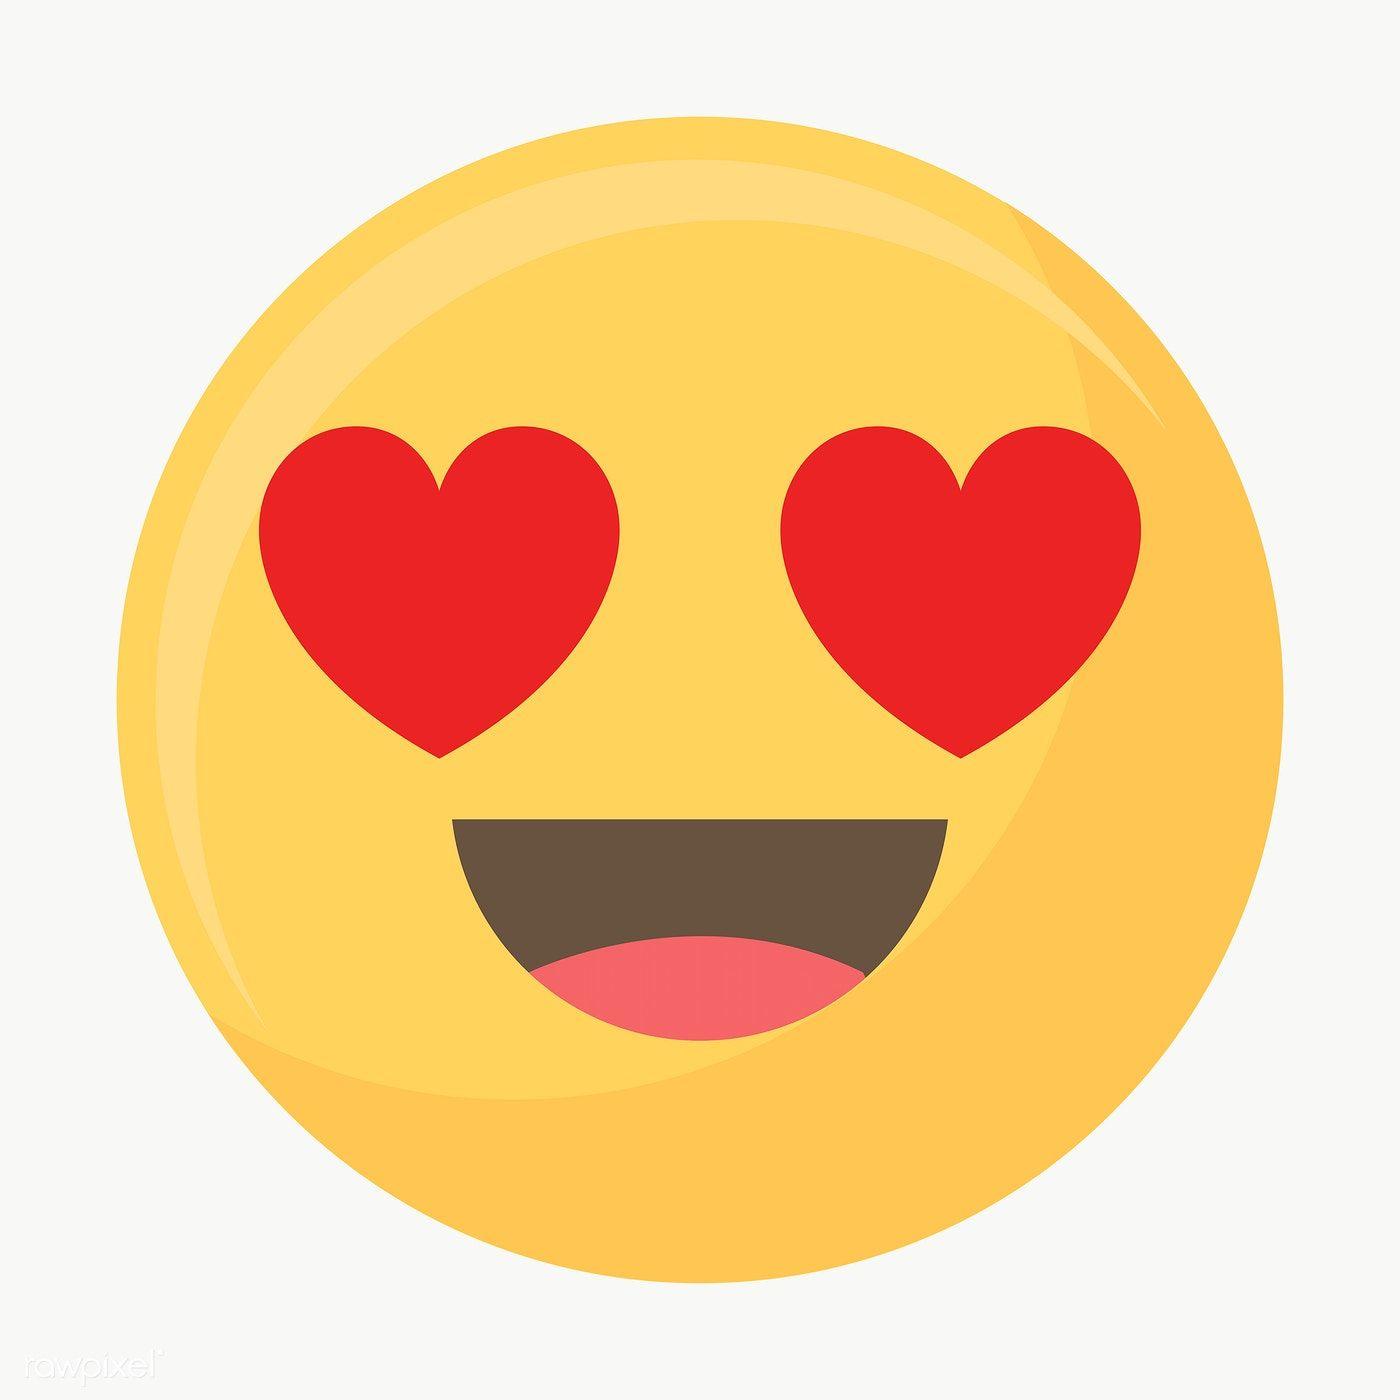 Download Premium Png Of Hearted Eyes Face Emoticon Symbol Transparent Png Emoticon Cute Emoji Symbols